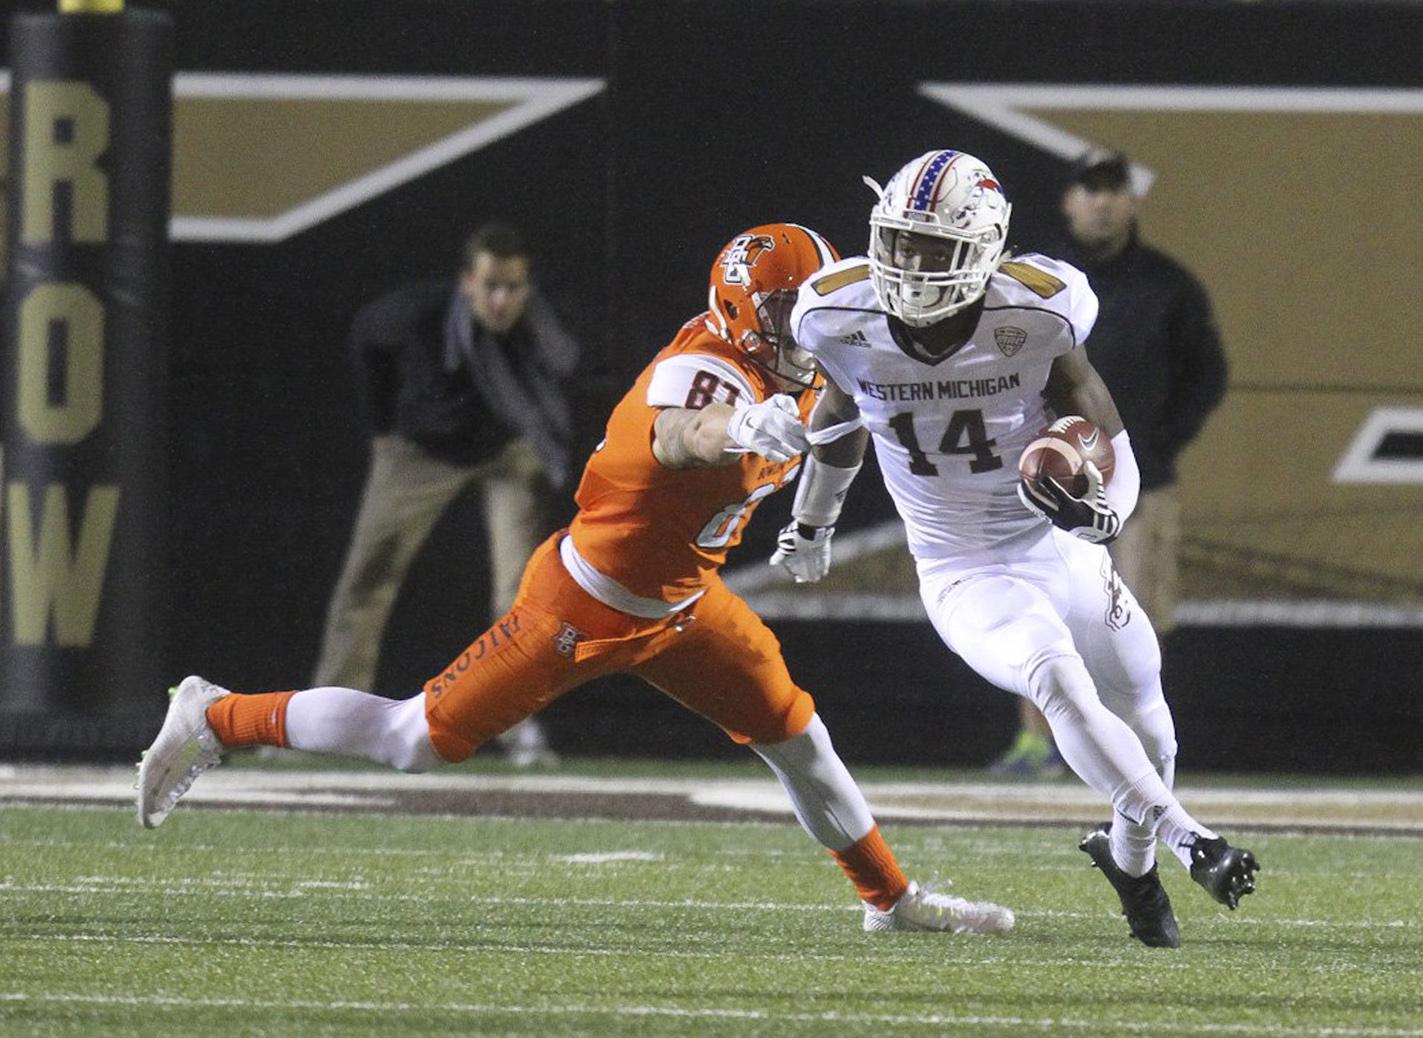 Western Michigan's Darius Phillips (14) carries against Bowling Green during an NCAA college football game Wednesday night, Nov. 11, 2015, in Kalamazoo, Mich. (Daytona Niles/The Gazette via AP